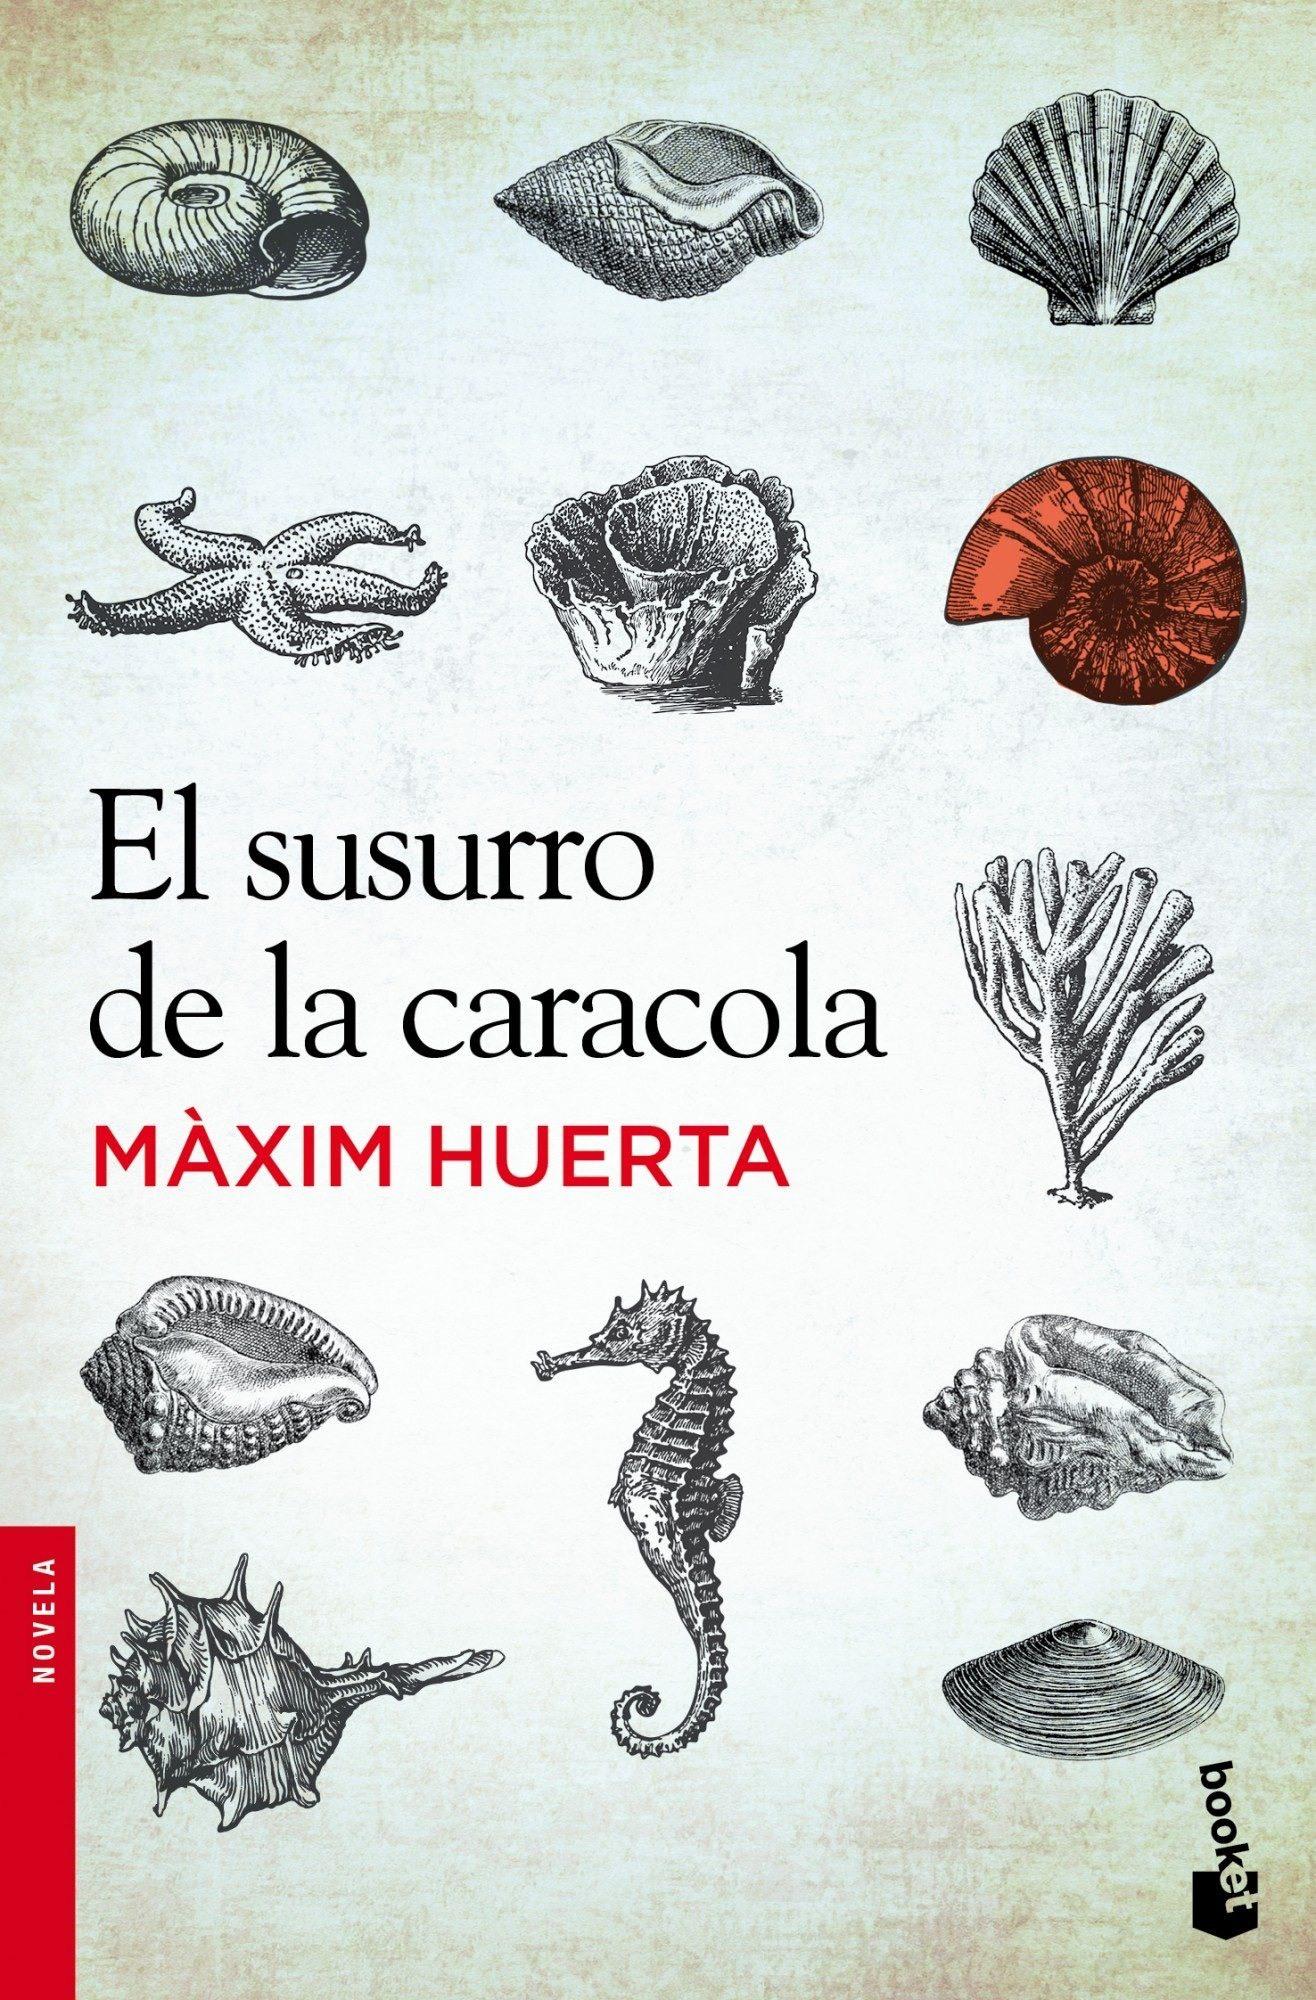 Los mundos de Màxim Huerta